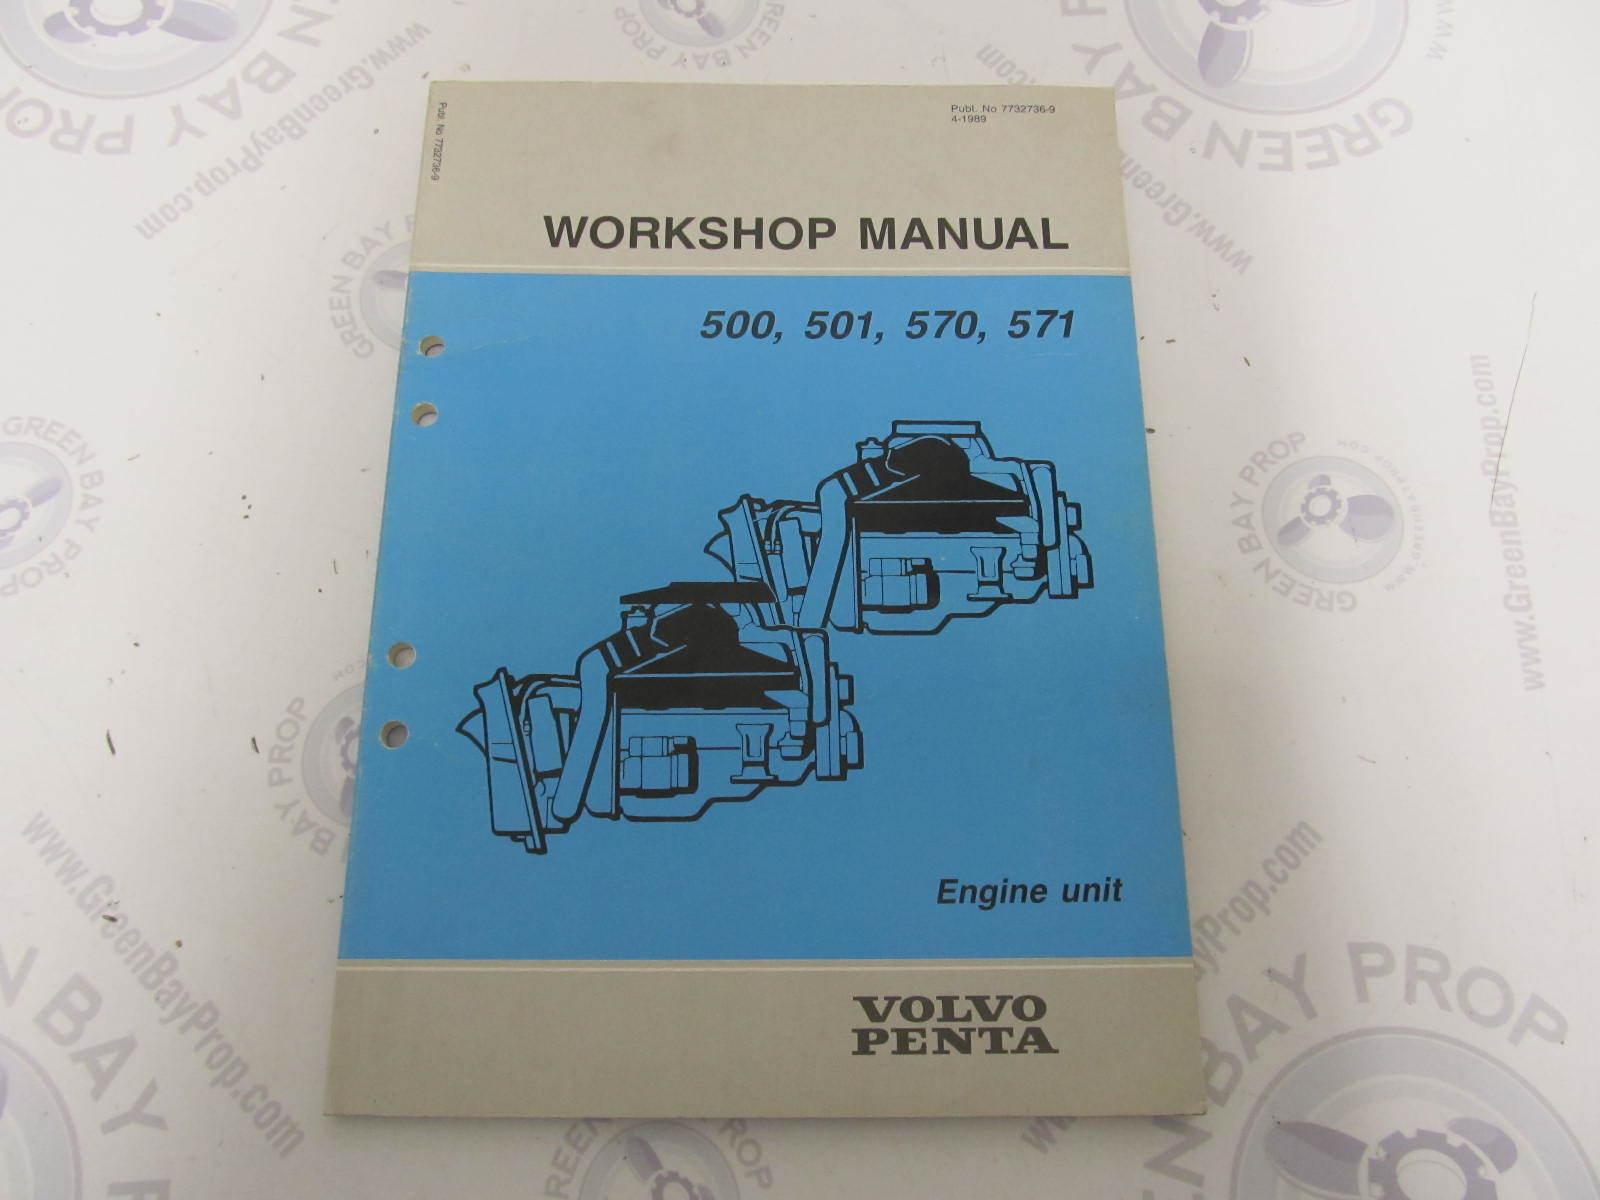 7732736 9 volvo penta workshop manual 500 501 570 571 engine unit rh greenbayprop com Volvo Penta Wiring Harness Volvo Penta Lower Unit